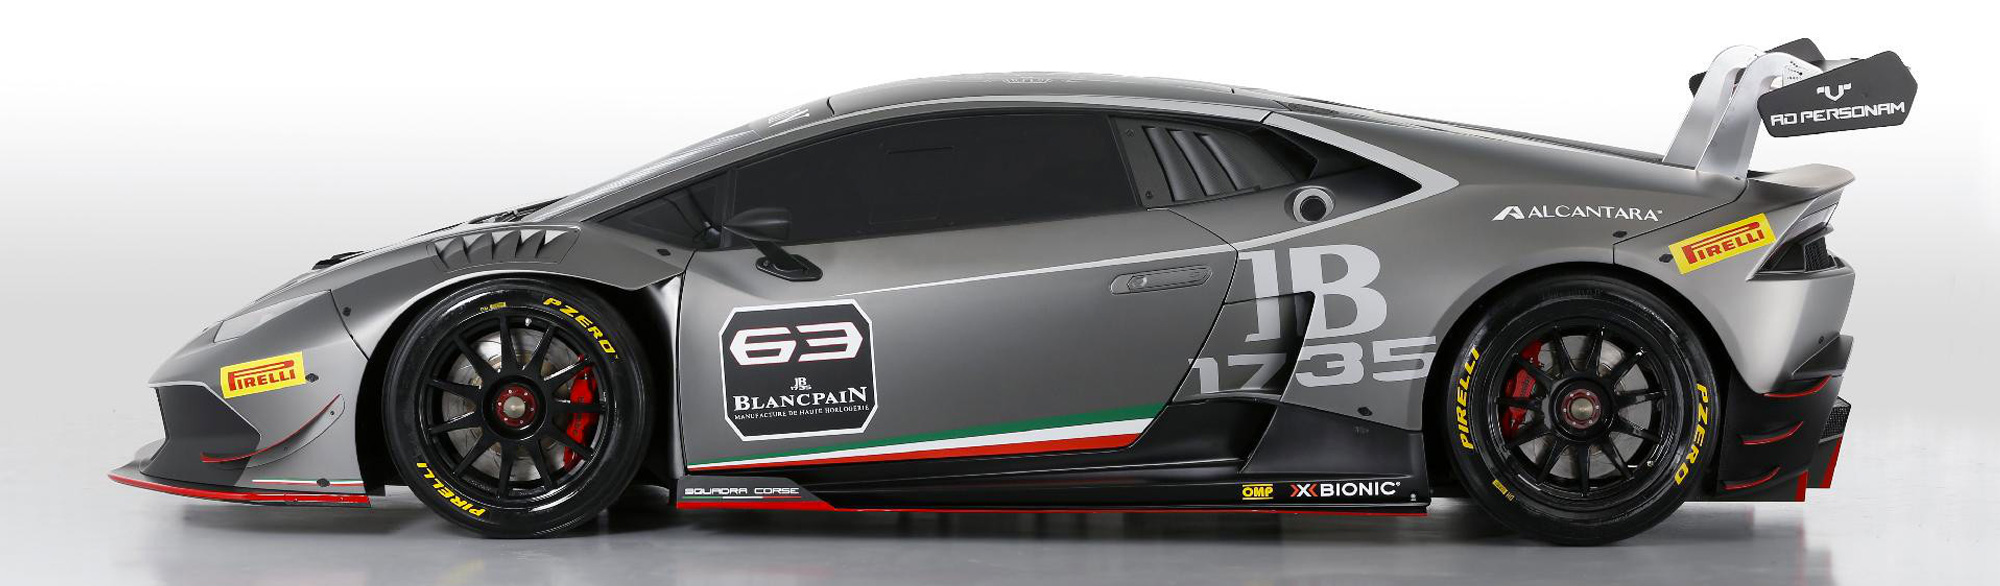 TRG Lamborghini Huracan Super Trofeo /></div> </div> <div id=